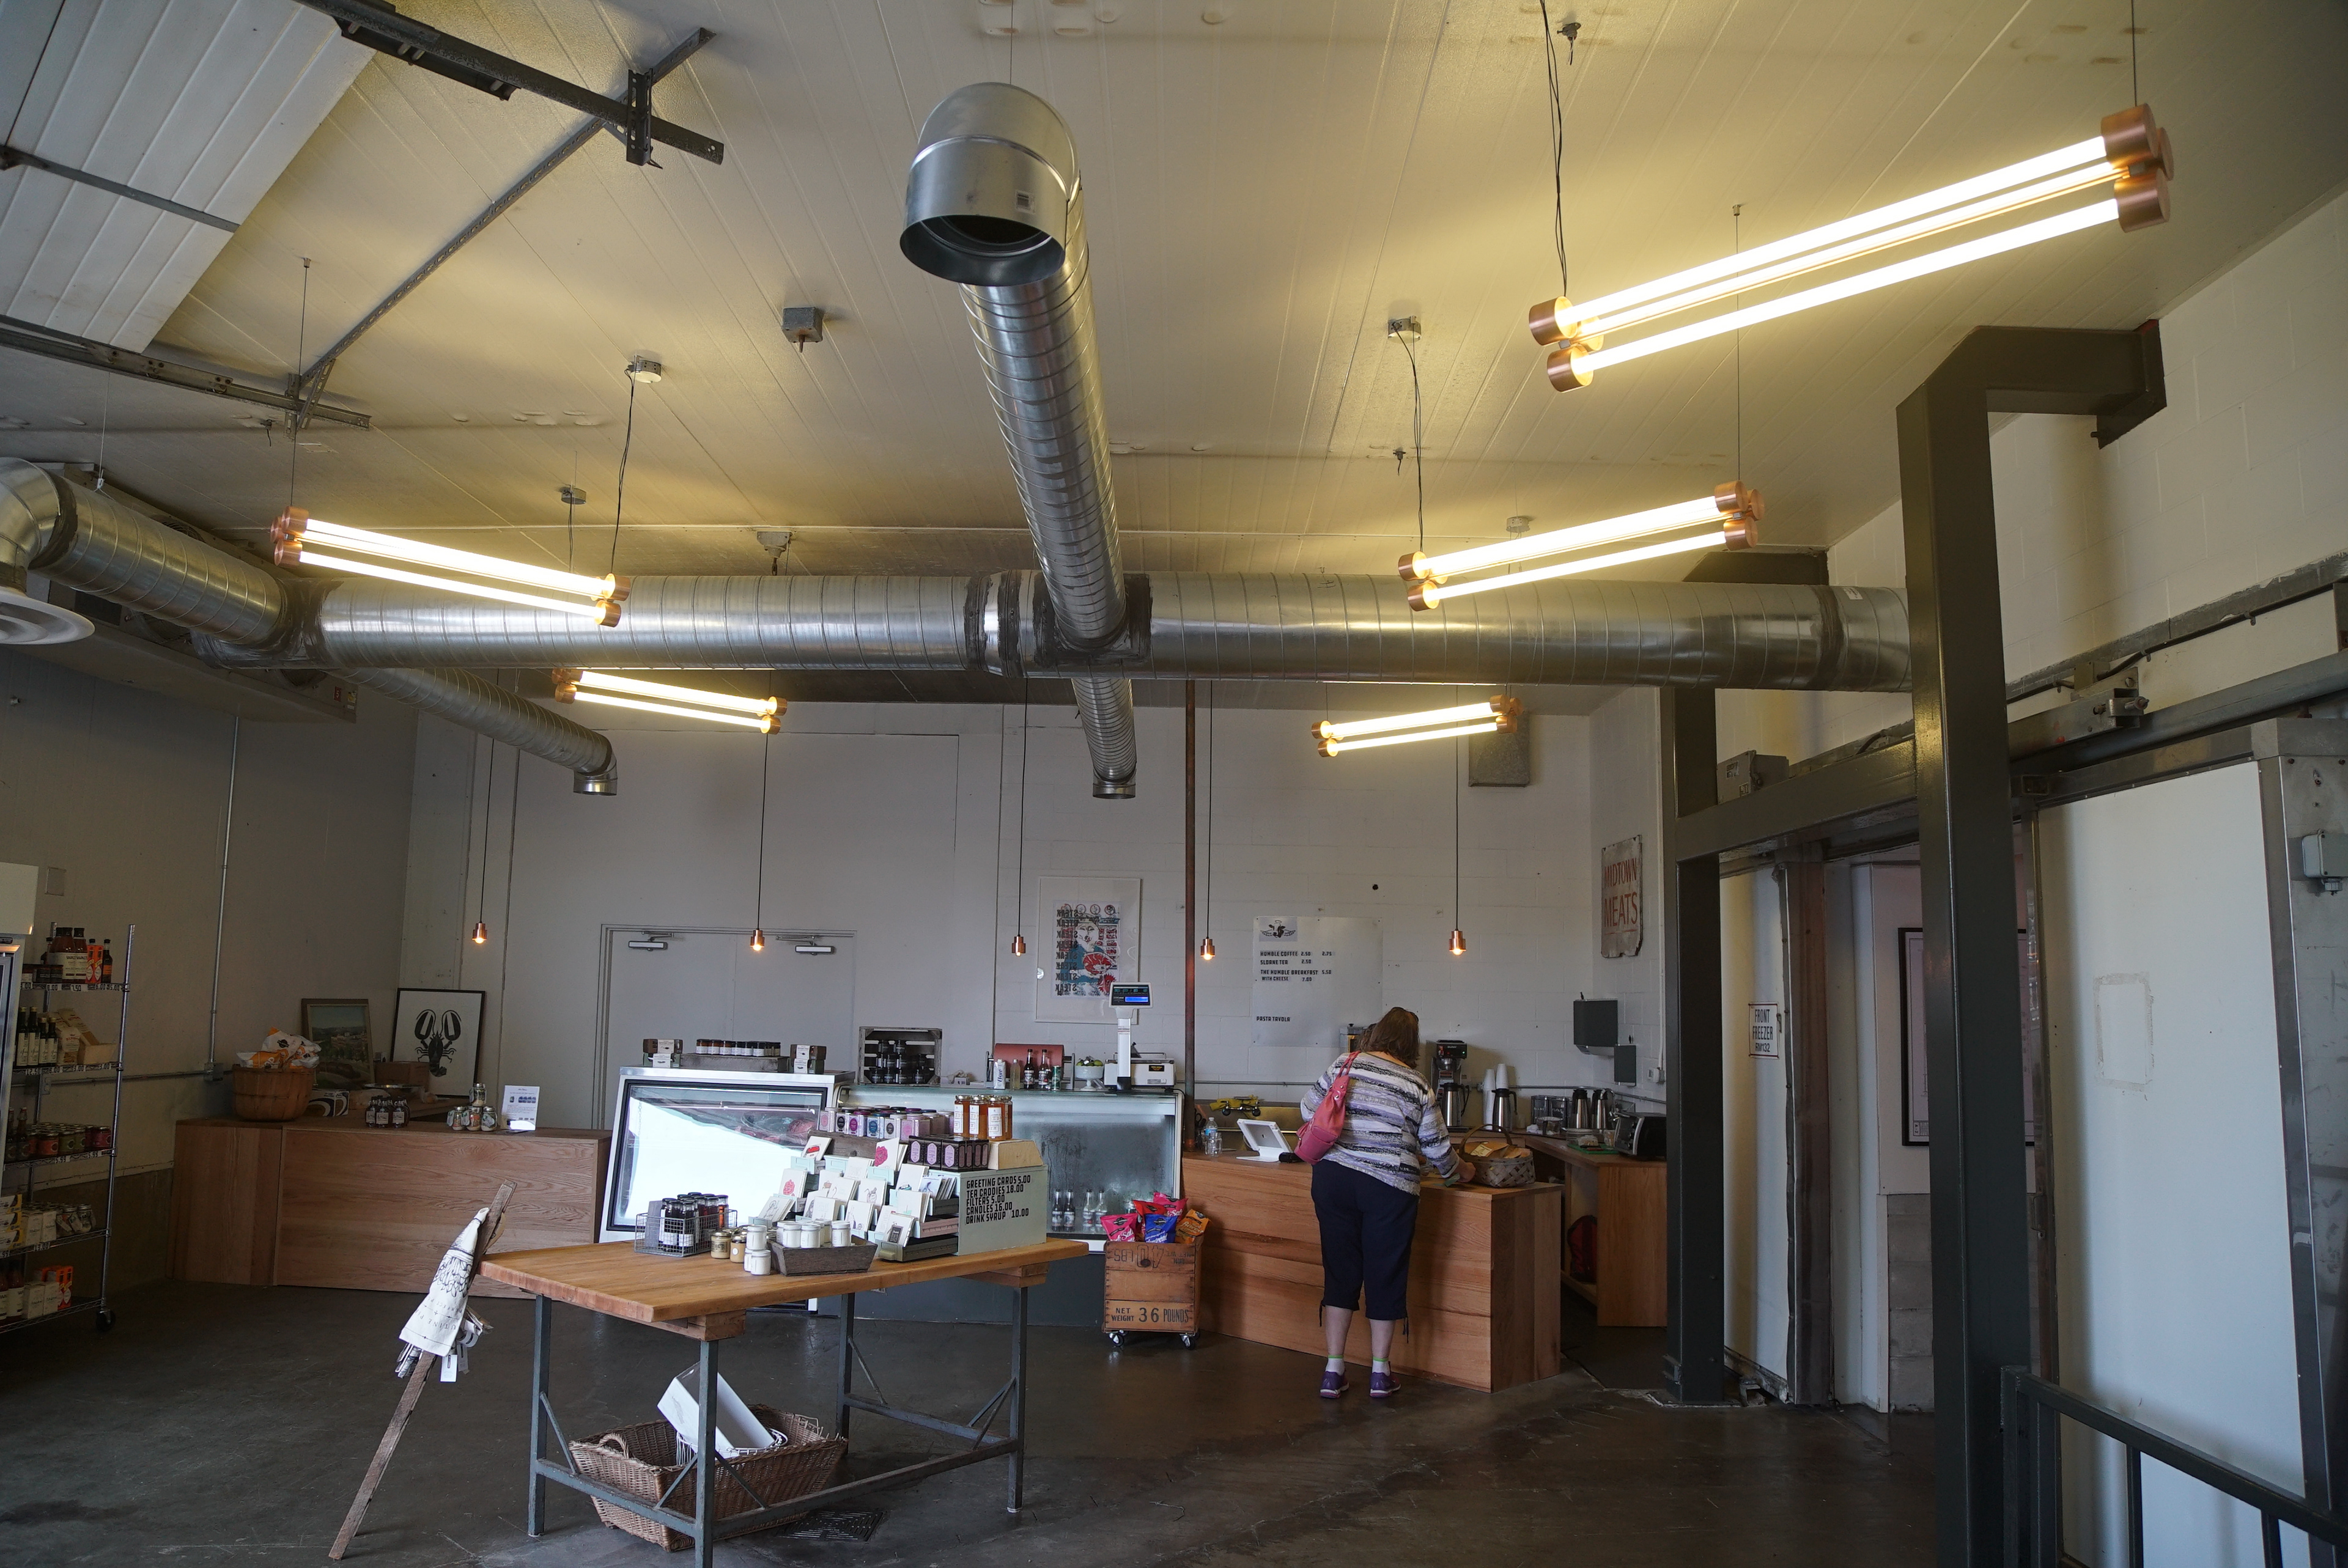 lighting bend gallery sam local light interior oregon central s